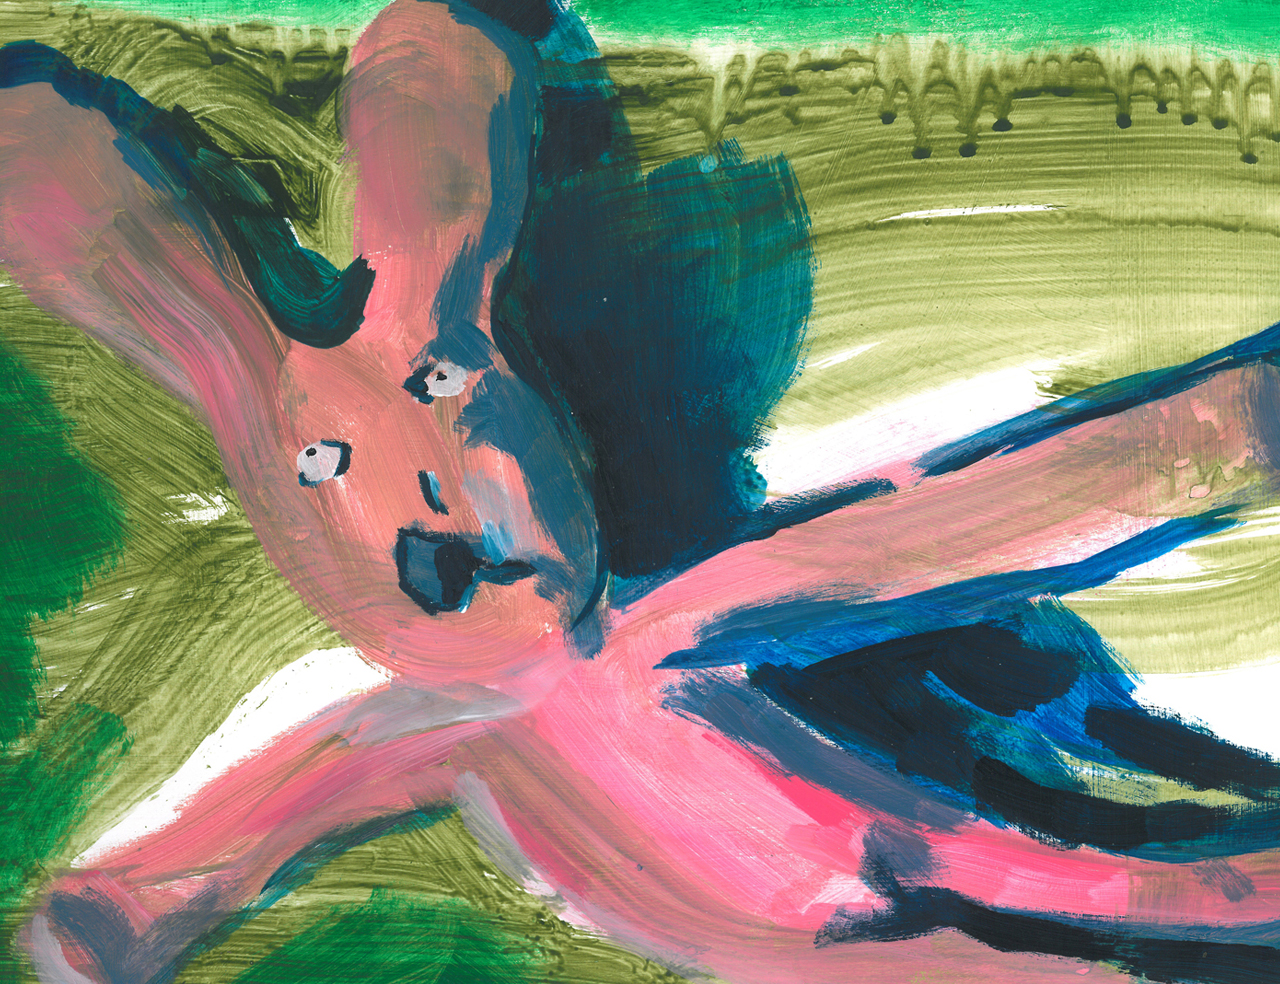 Hare left lying | Acrylic on Paper / 33x22 cm / 2015